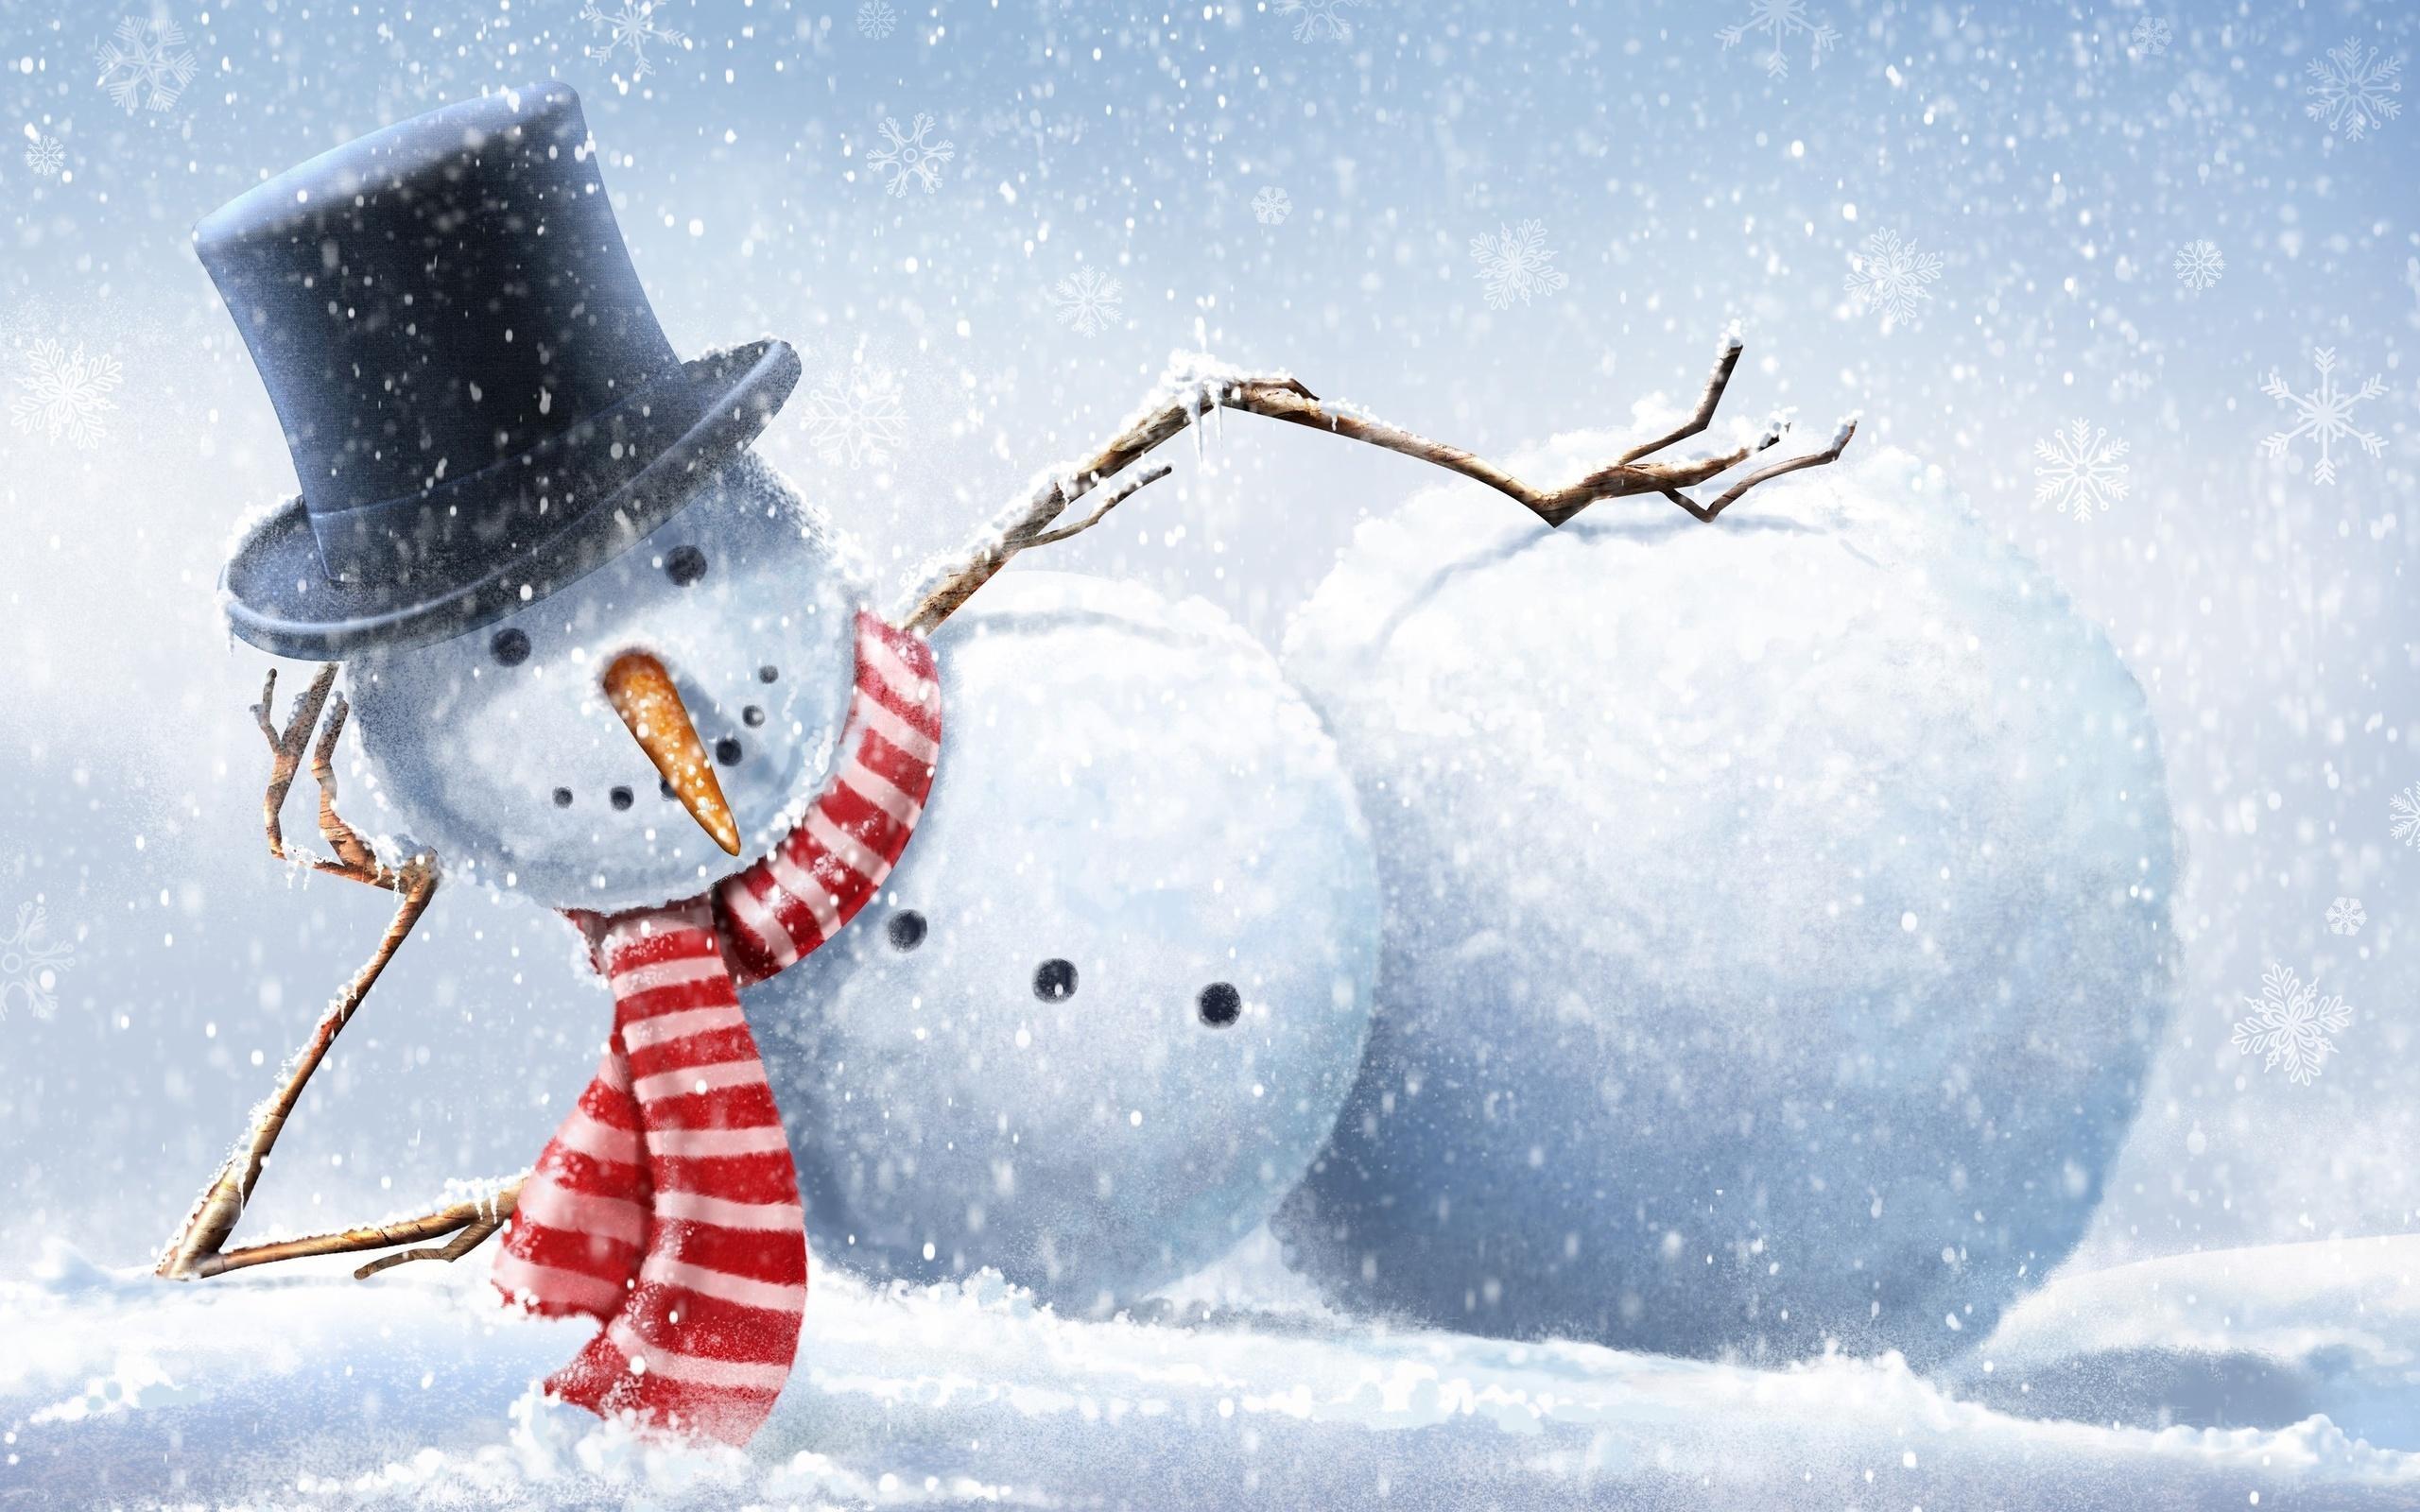 Country Snowman Desktop Wallpaper 41 images 2560x1600